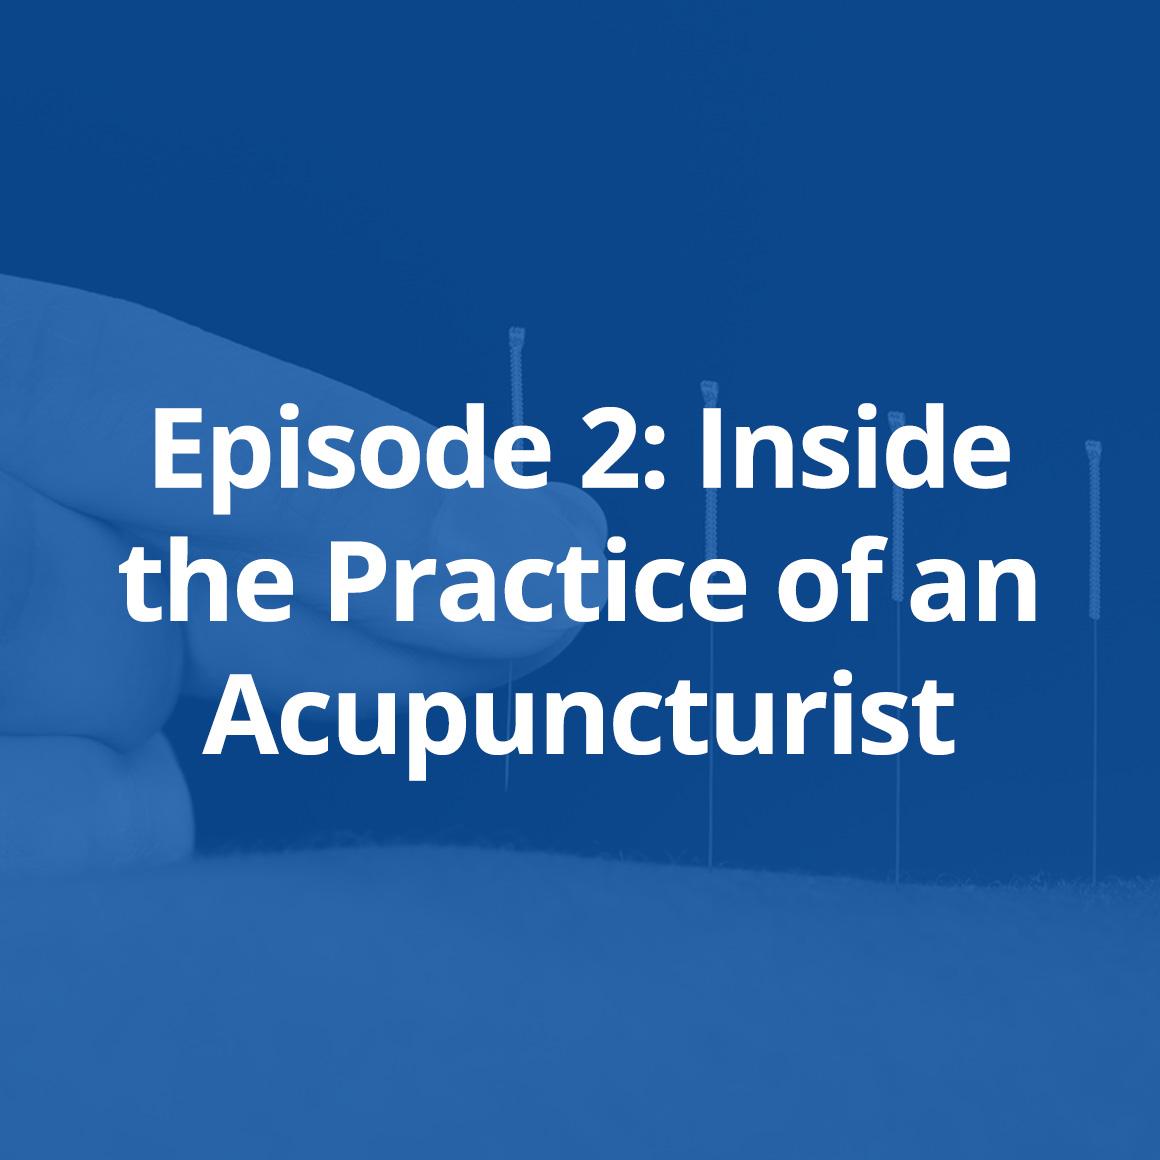 practice-of-an-acupuncturist